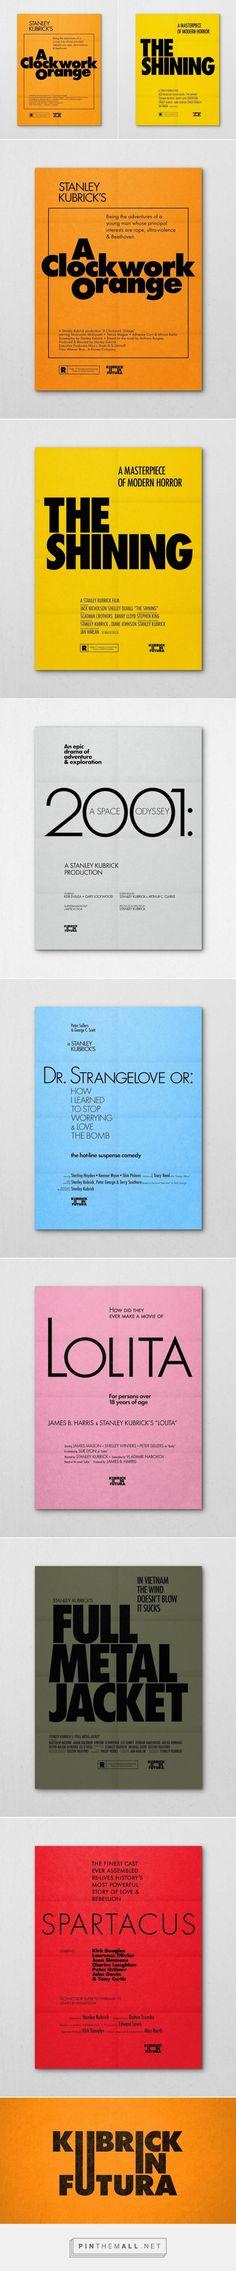 Kubrick's Movie Posters in Futura – Fubiz Media - created via http://pinthemall.net